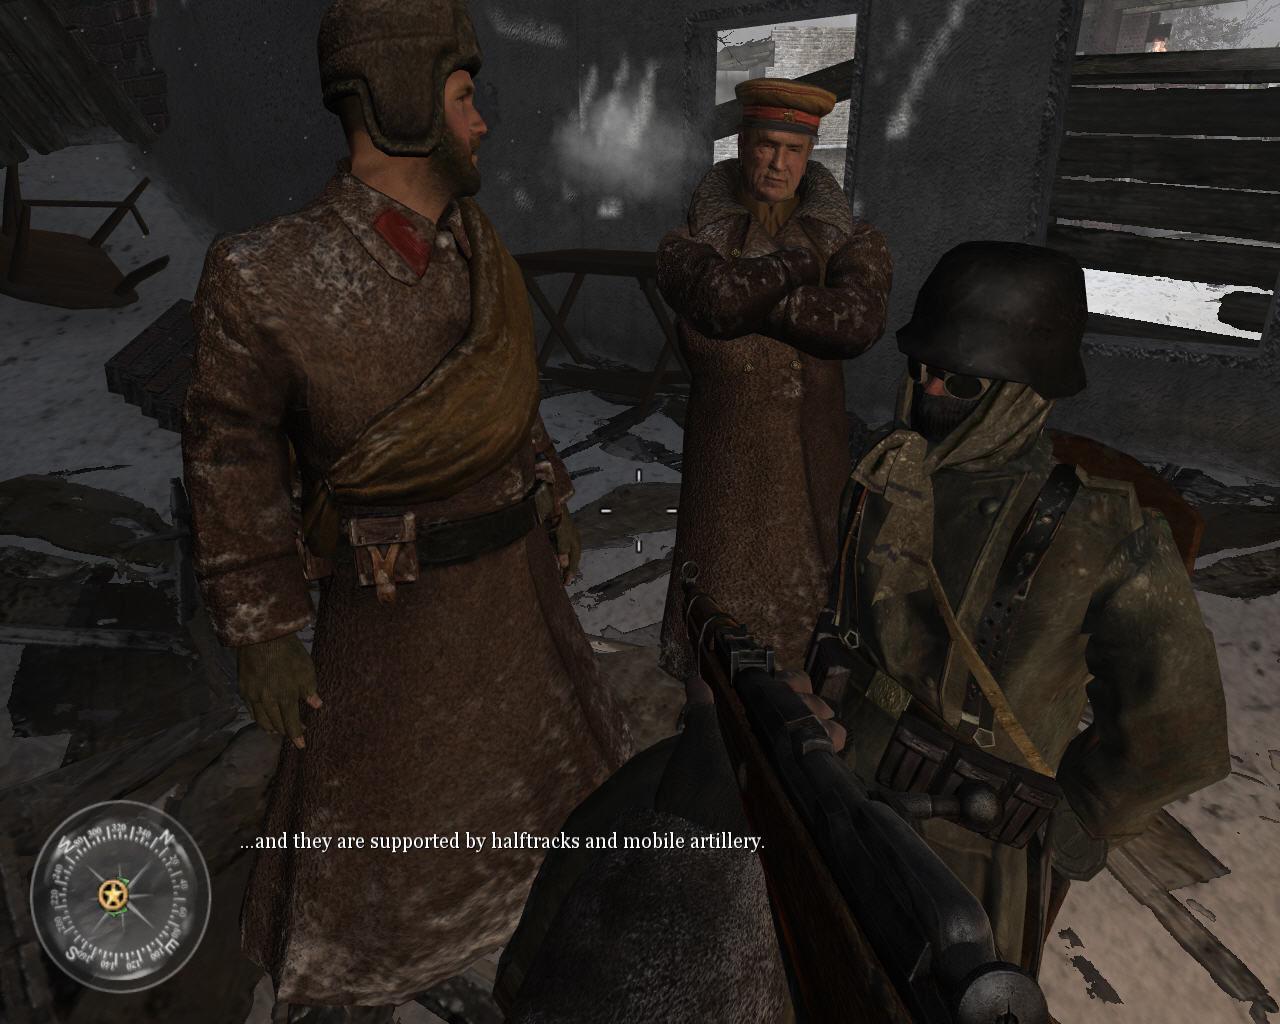 137975-call-of-duty-2-windows-screenshot-interrogation-of-german (1)